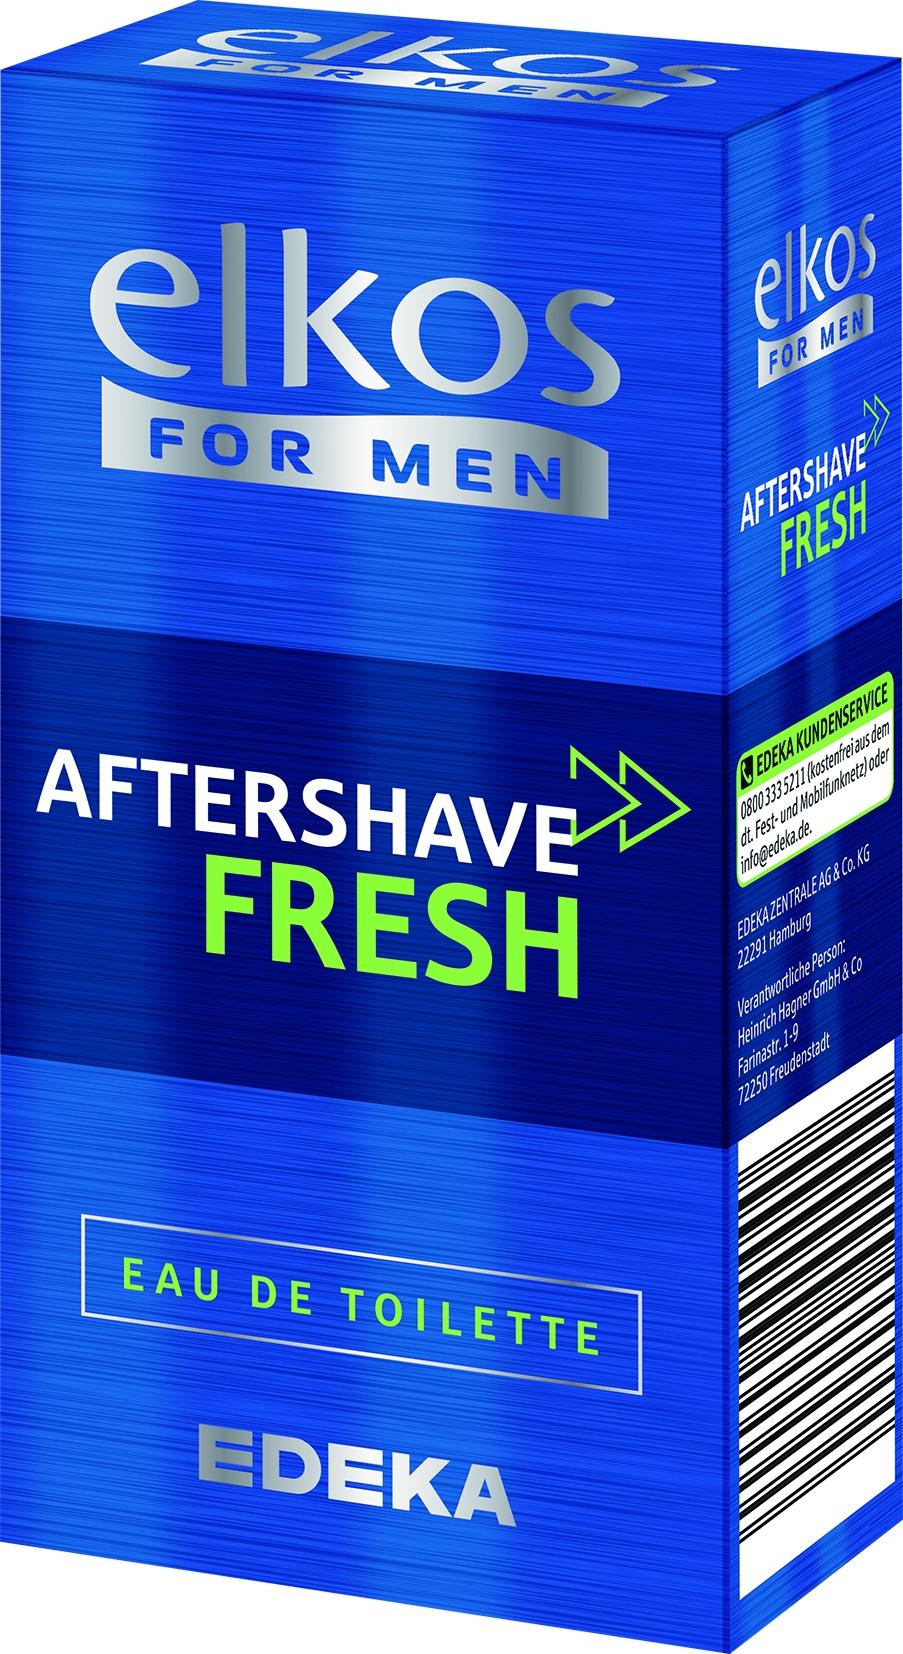 After Shave Fresh